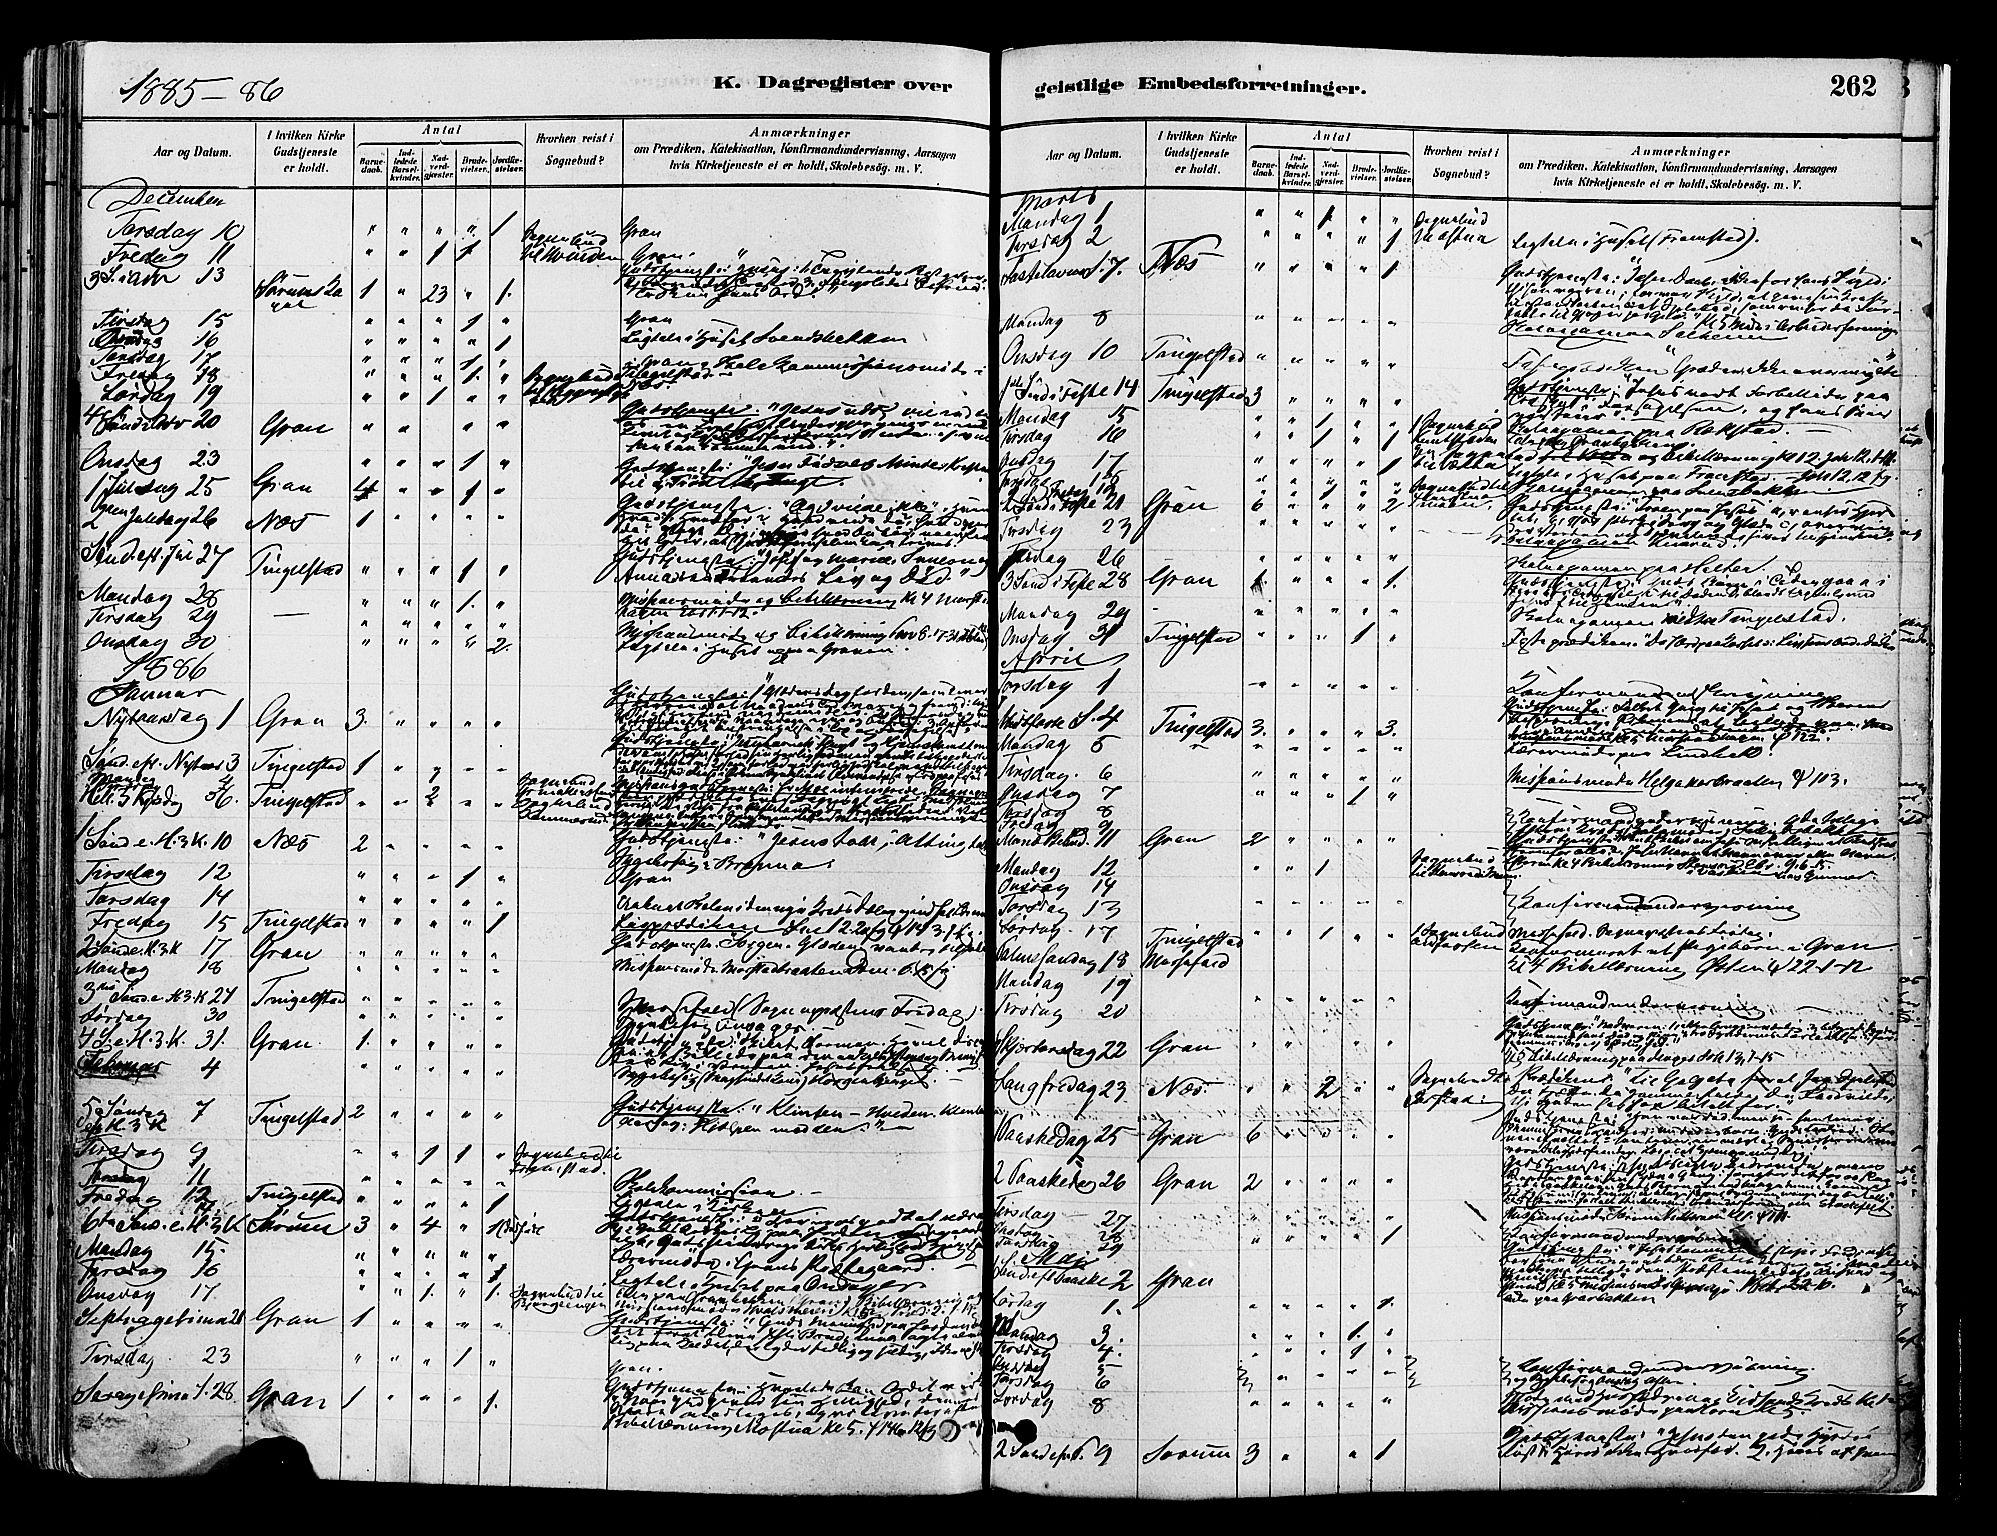 SAH, Gran prestekontor, Ministerialbok nr. 14, 1880-1889, s. 262